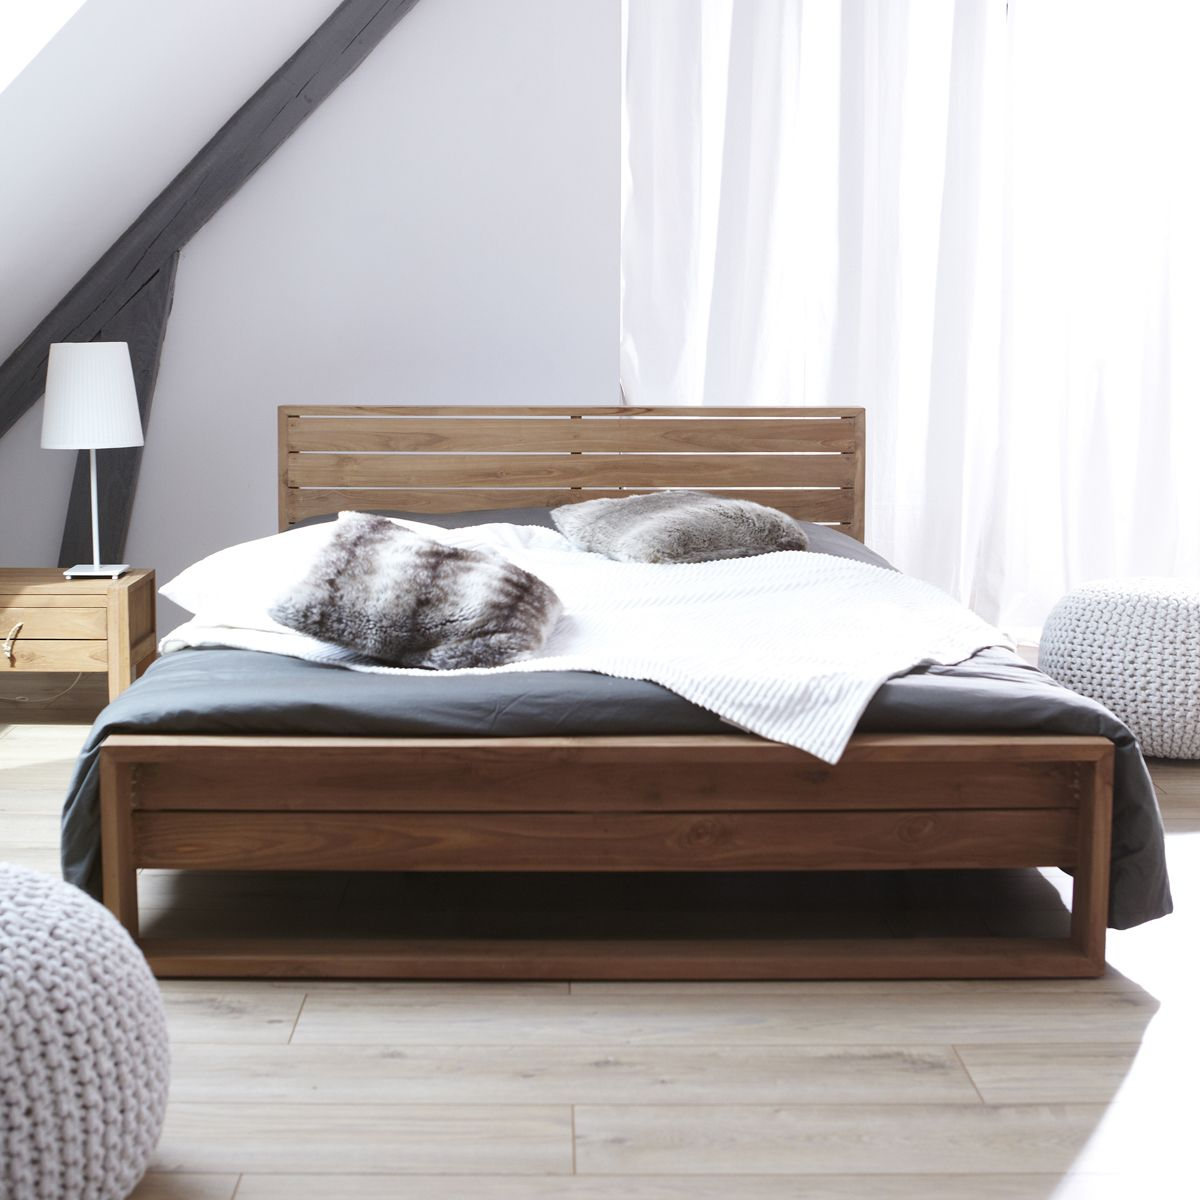 Teak-Bett 140x190 – Verkauf von Massivteak-Betten Minimalys ...